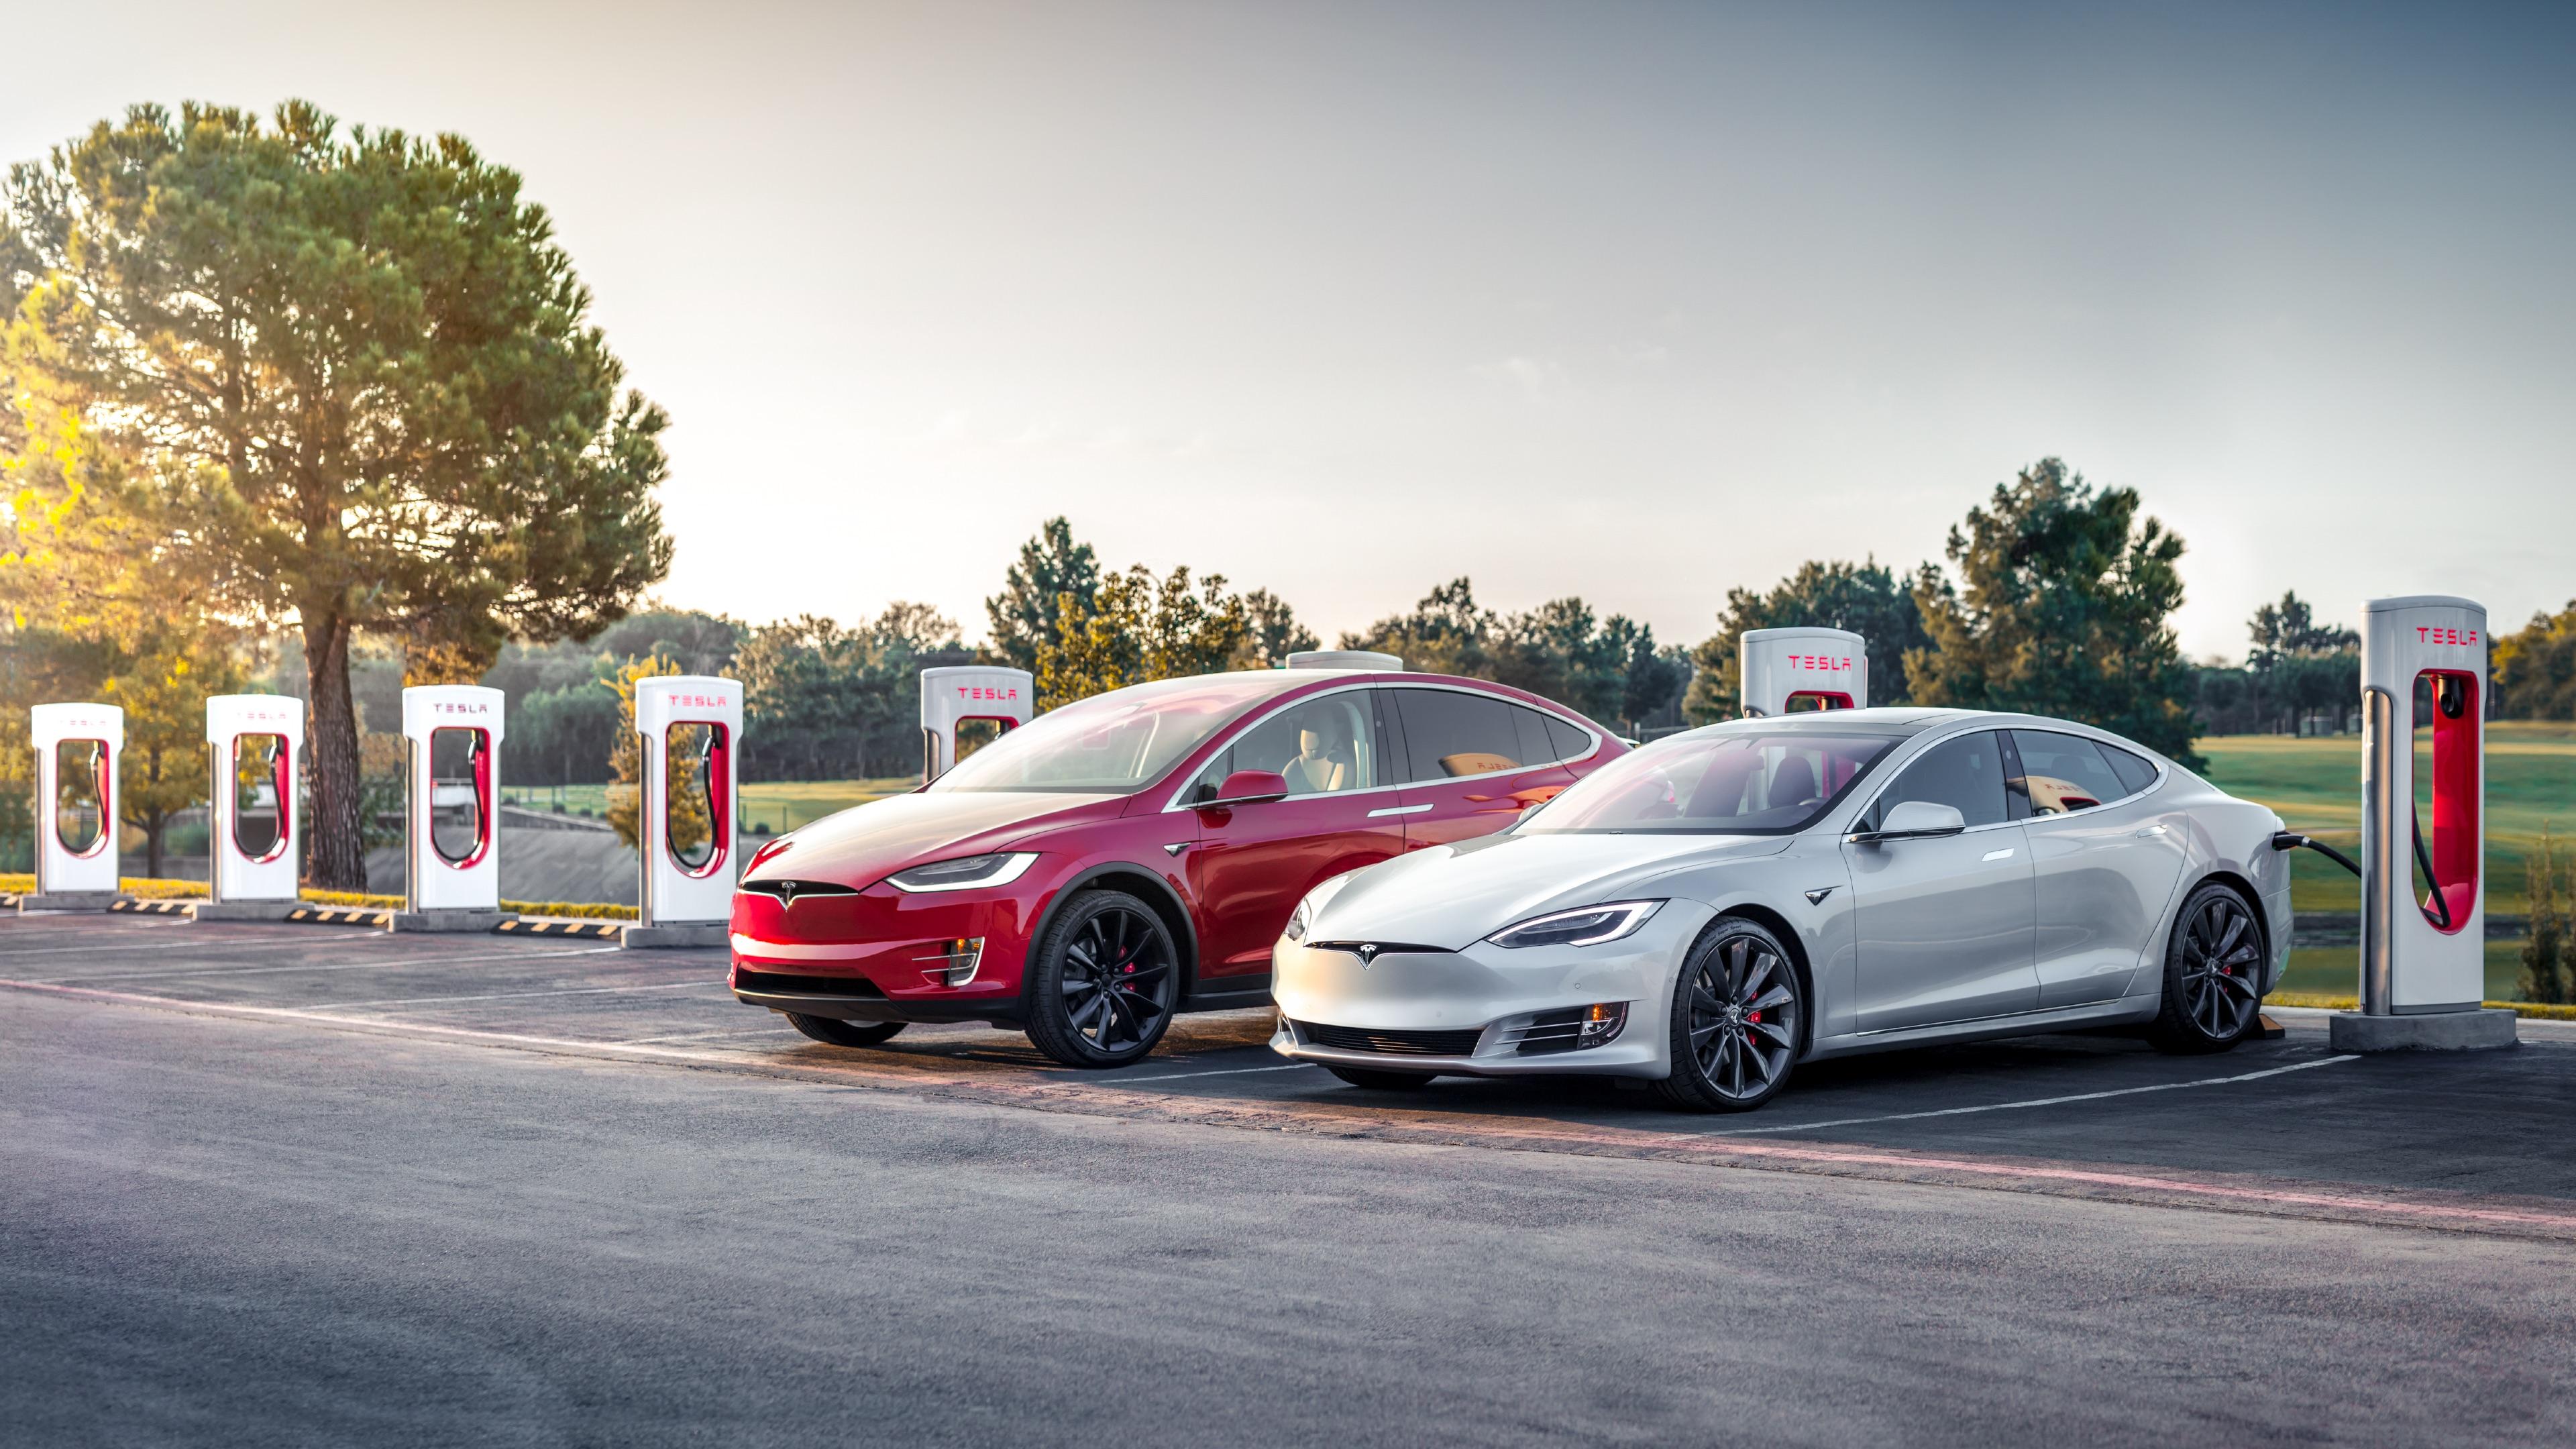 texas-supercharger-tesla-model-s-model-x